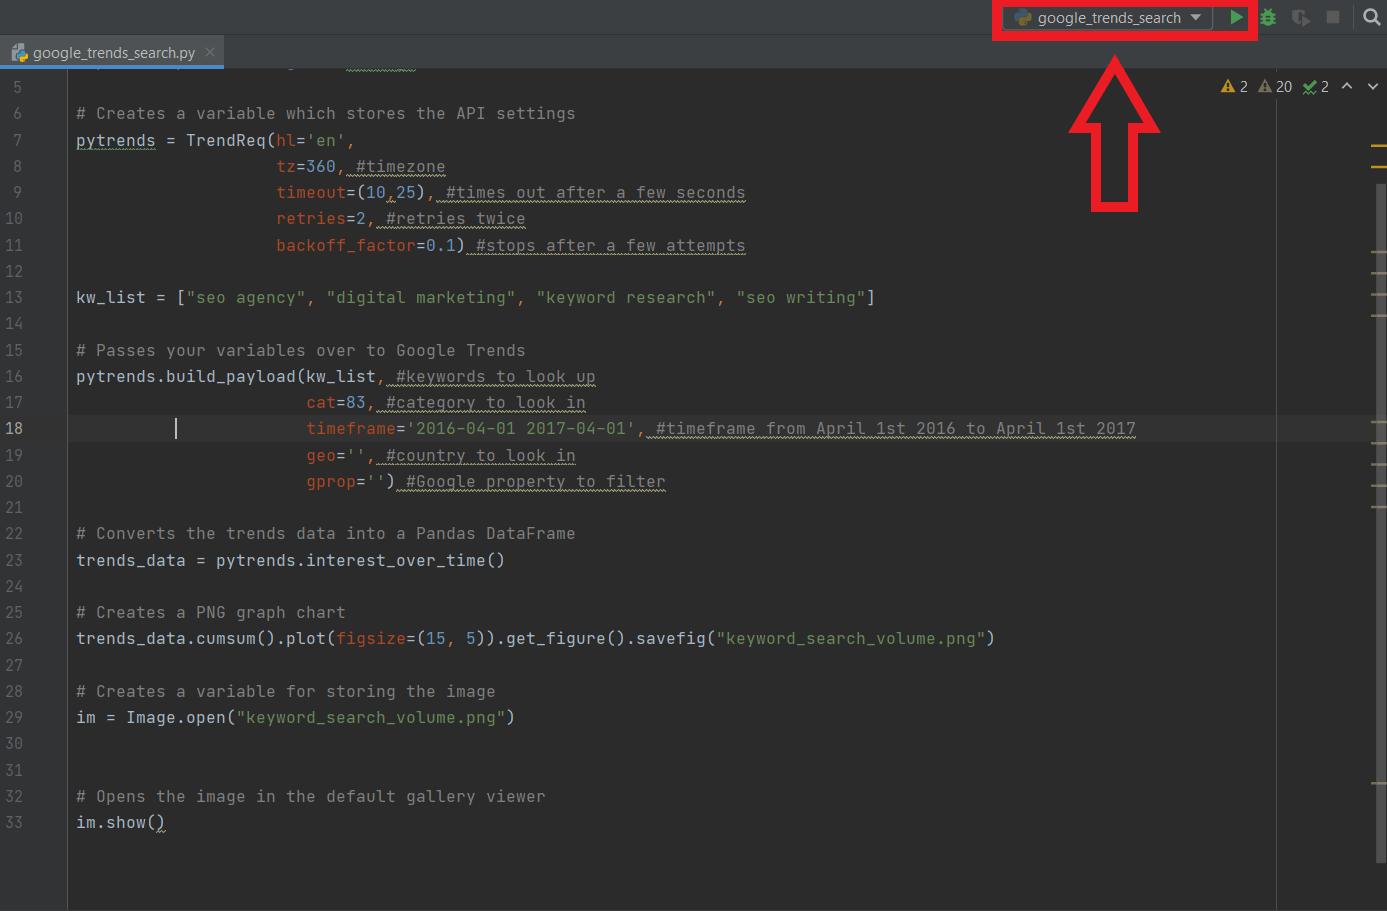 how to run program in pycharm